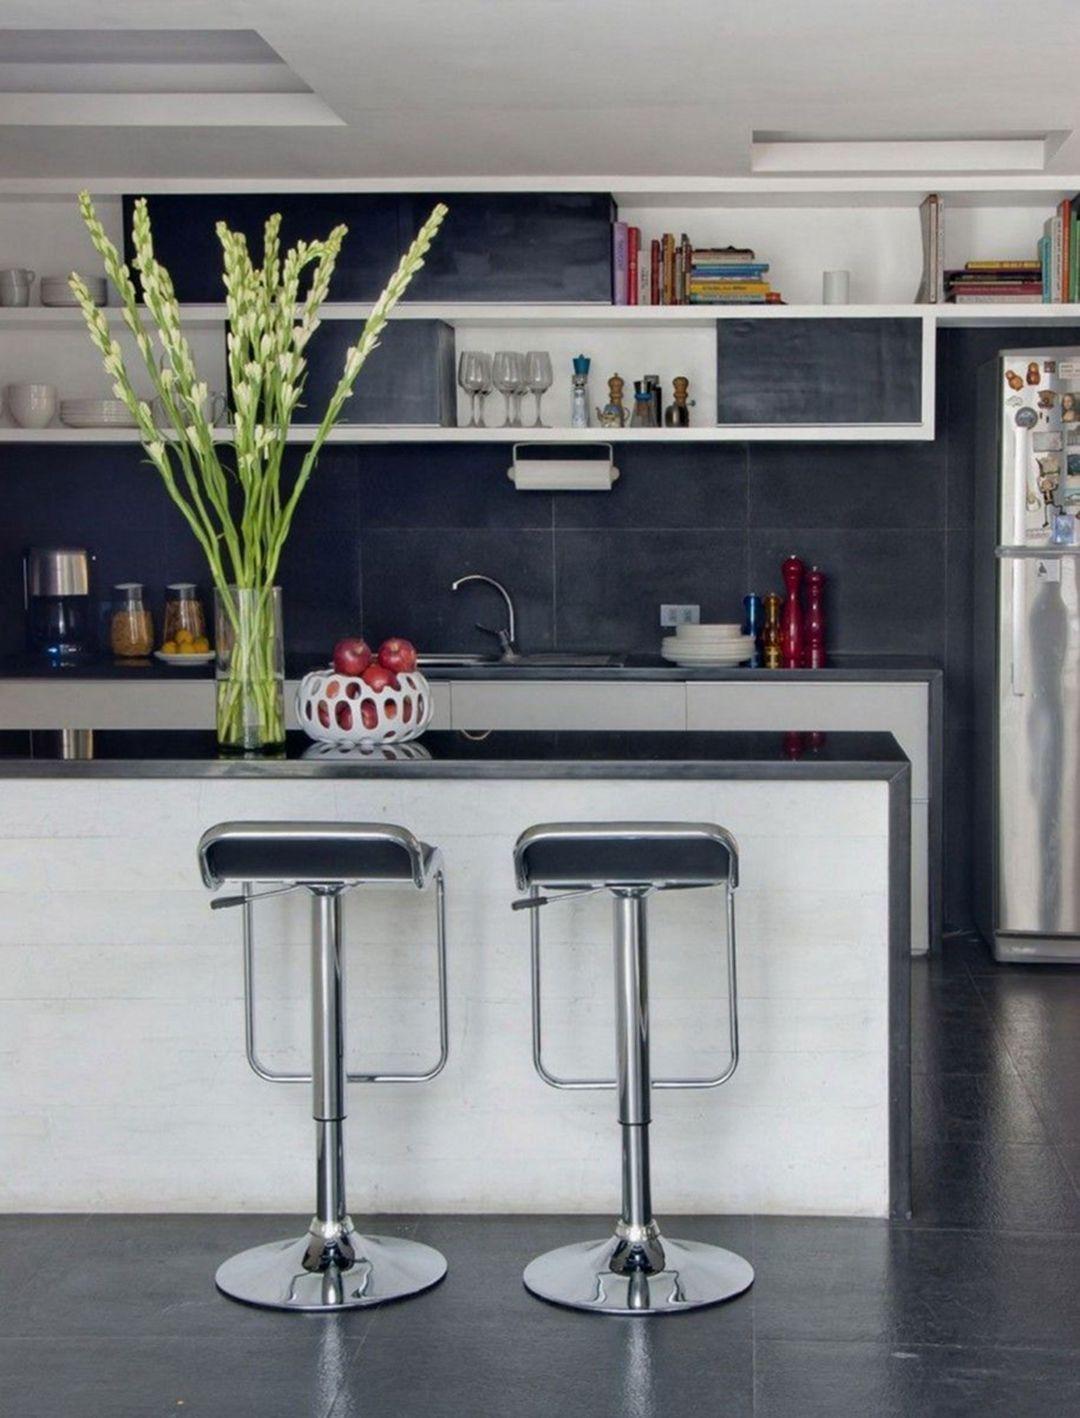 27 Fabulous Home Mini Bar Kitchen Designs For Amazing Kitchen Idea Decor It S Kitchen Bar Design Small Kitchen Bar Modern Kitchen Bar